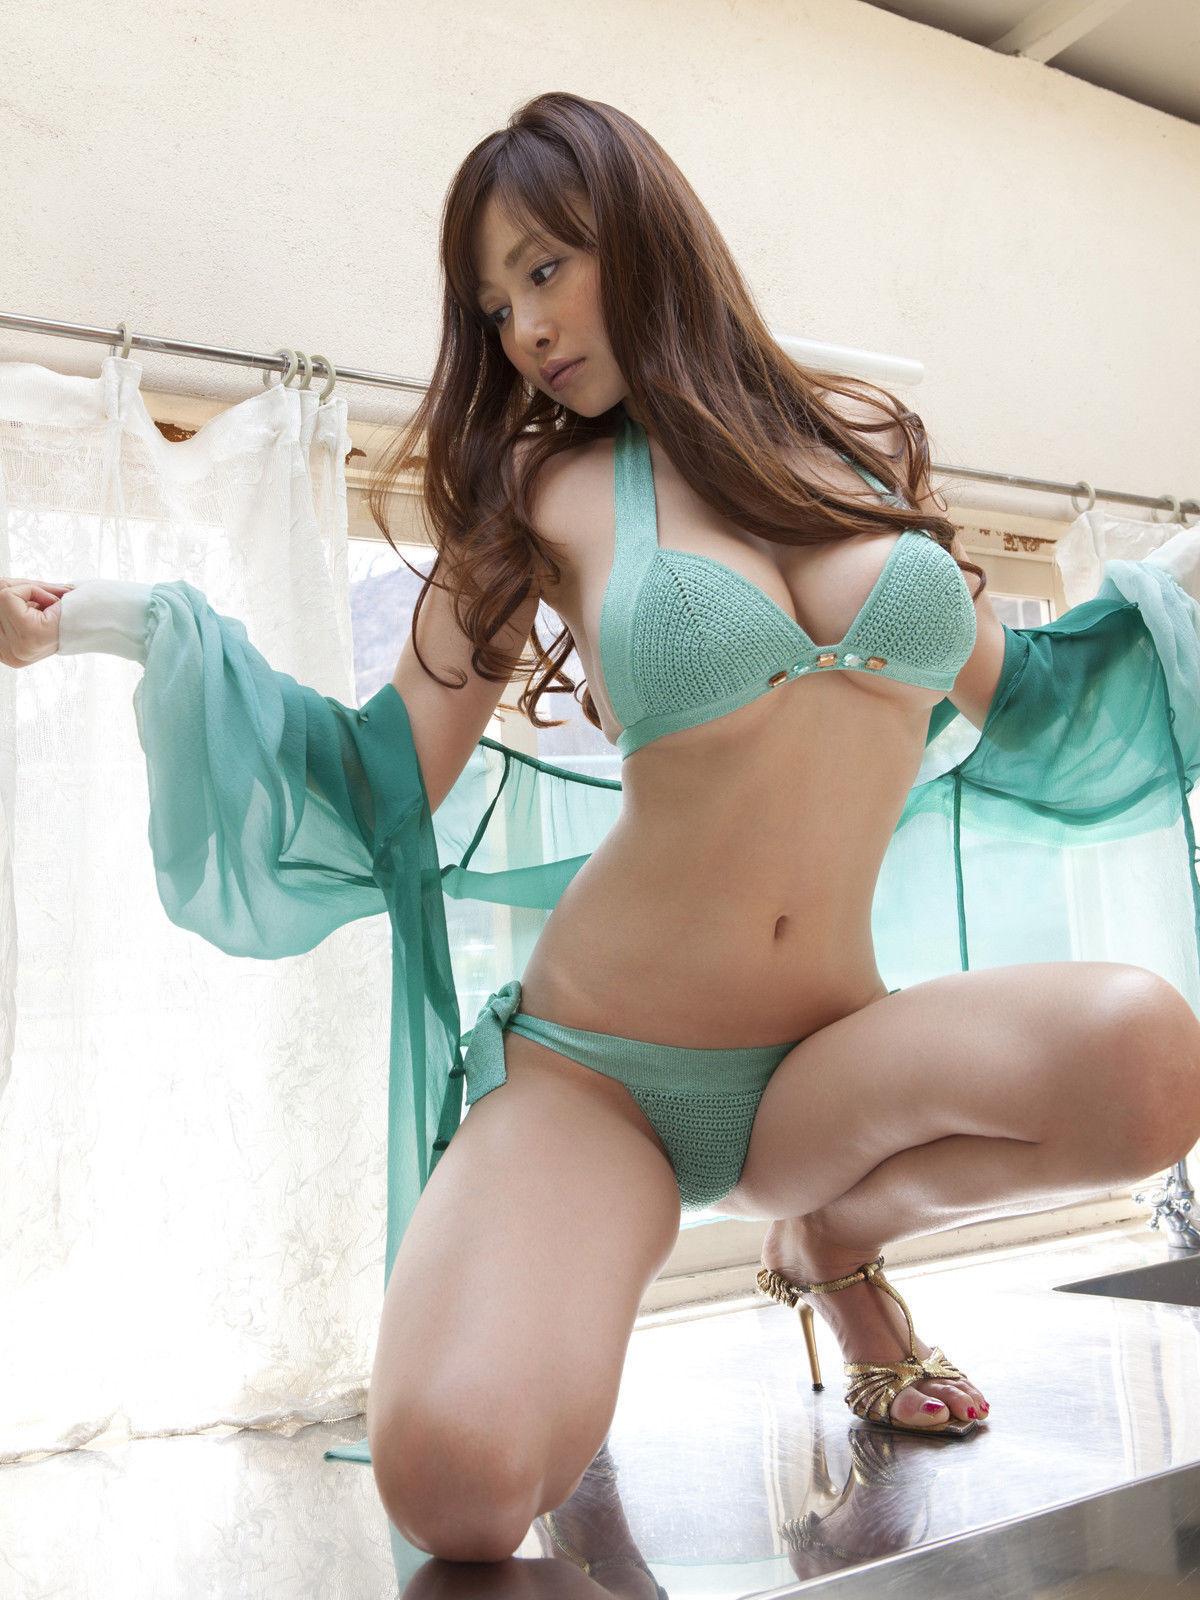 Amisha patel cute nude babes